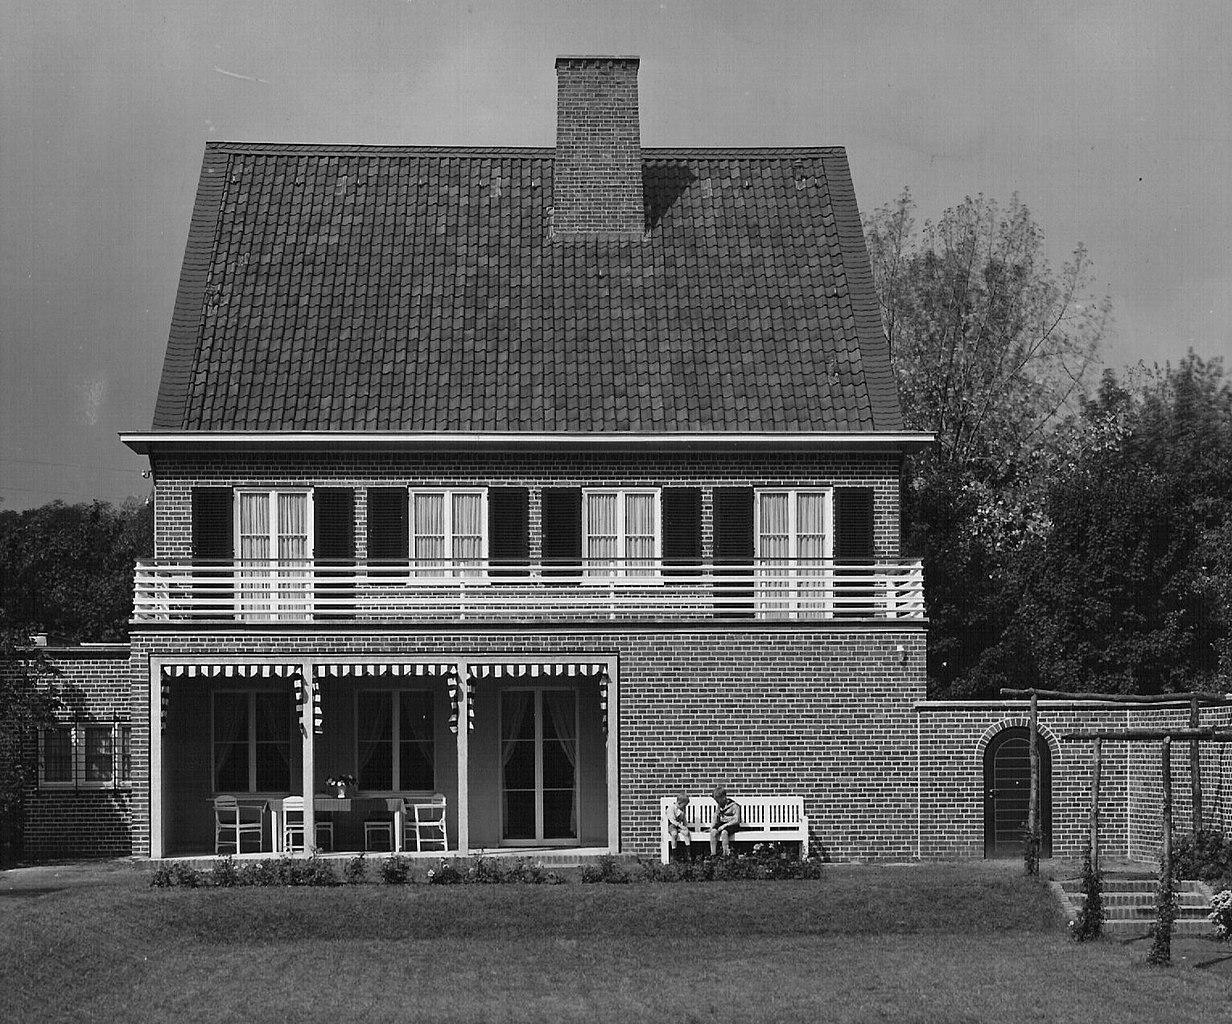 file 1927 haus j bartmann wikimedia commons. Black Bedroom Furniture Sets. Home Design Ideas